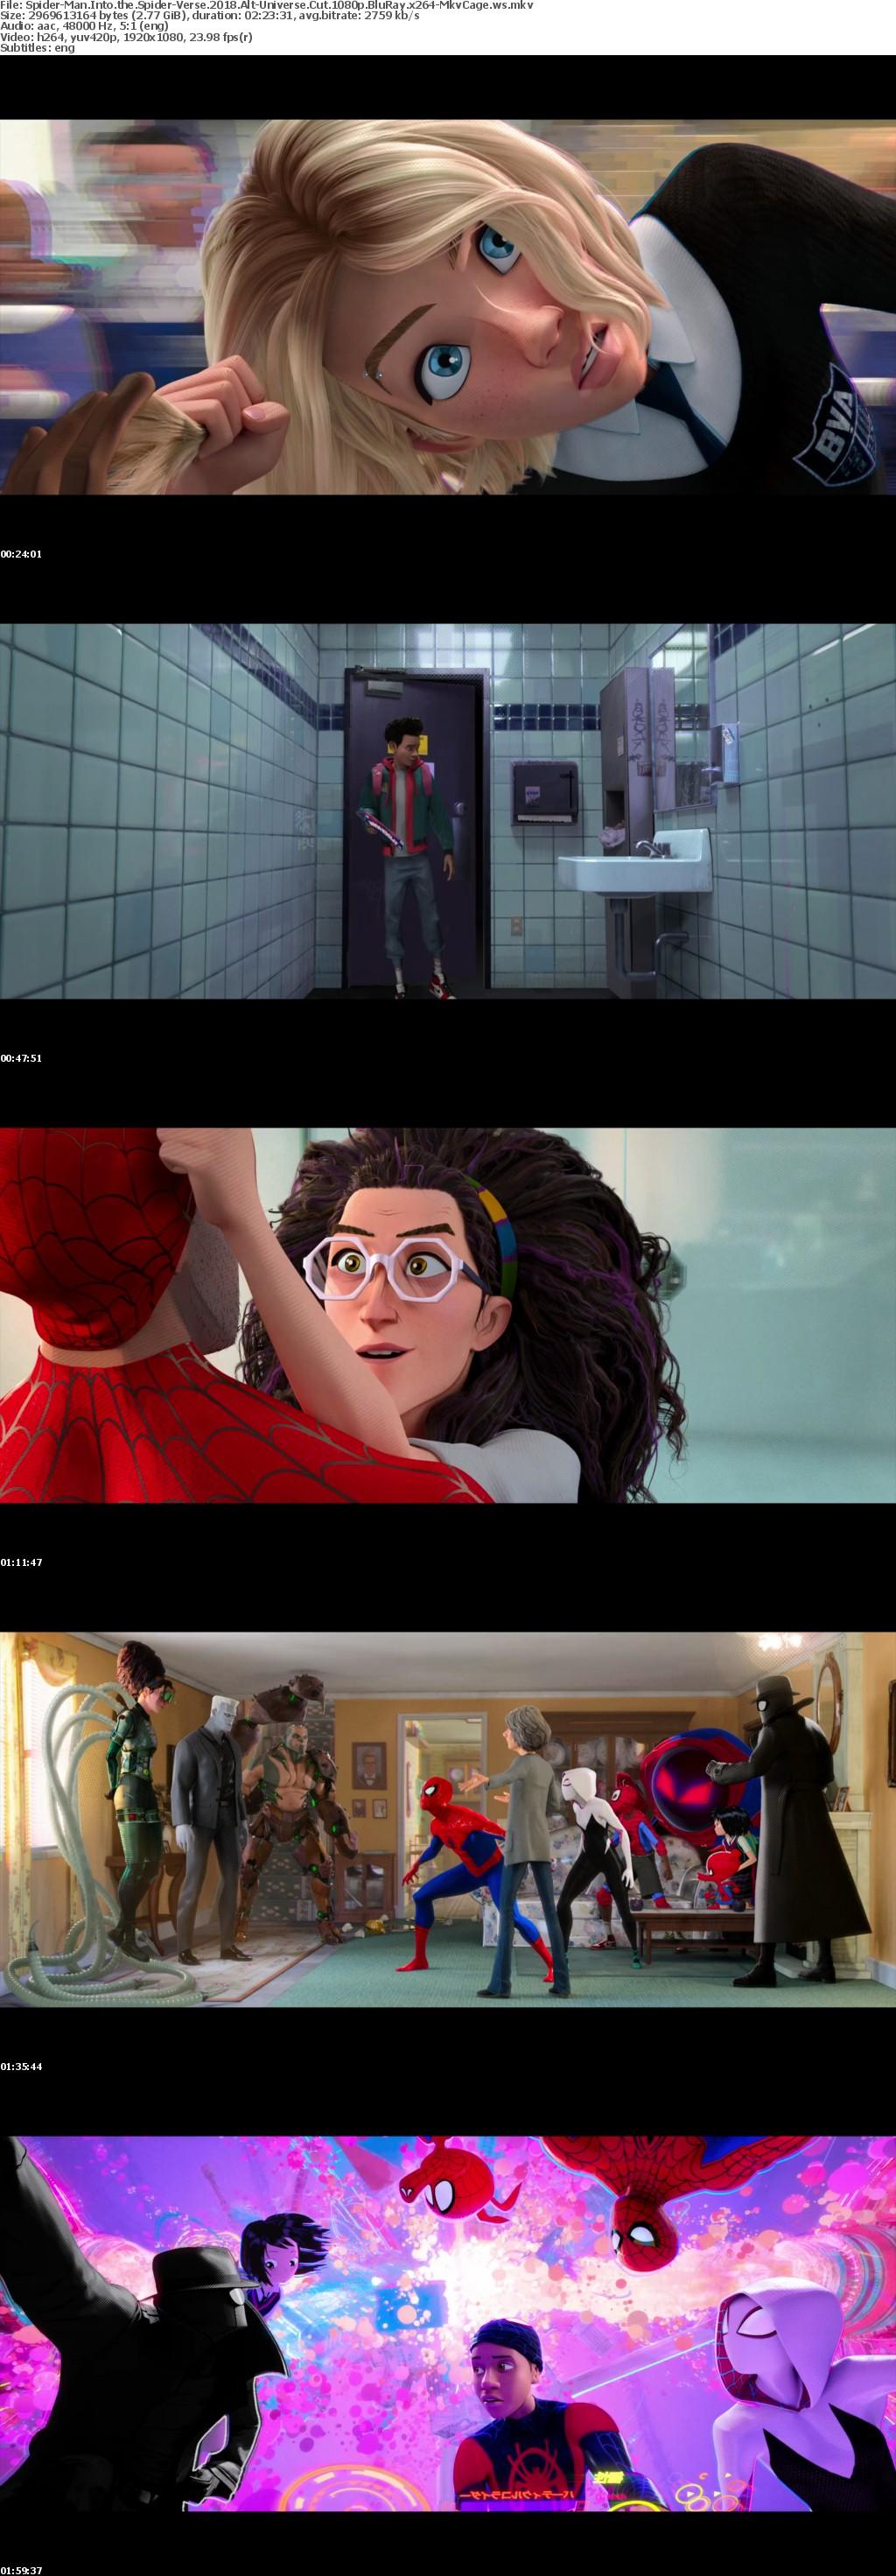 Spider-Man Into the Spider-Verse 2018 Alt-Universe Cut 1080p BluRay x264-MkvCage